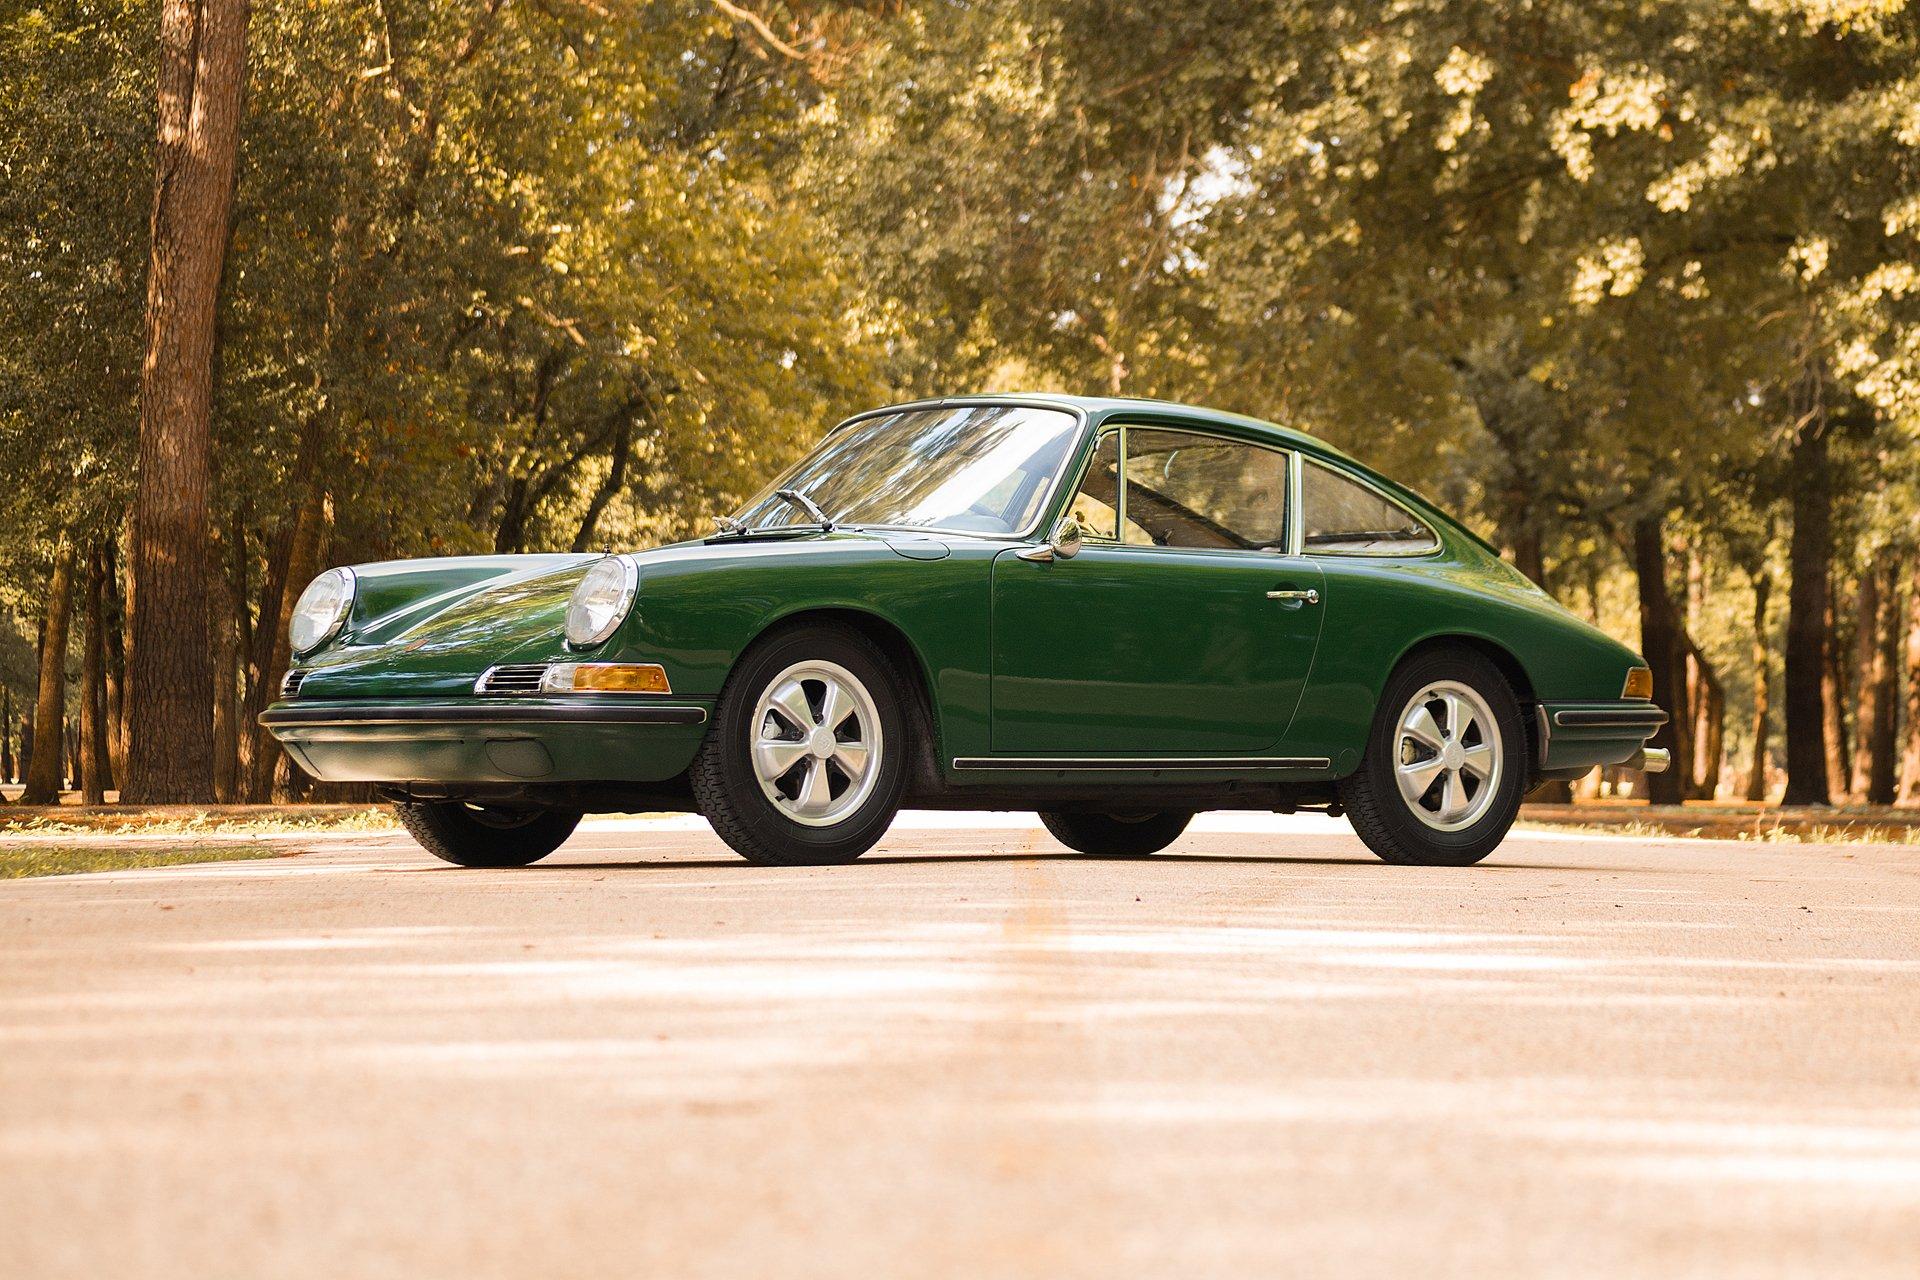 1967 Porsche 911s Driversource Fine Motorcars Houston Tx